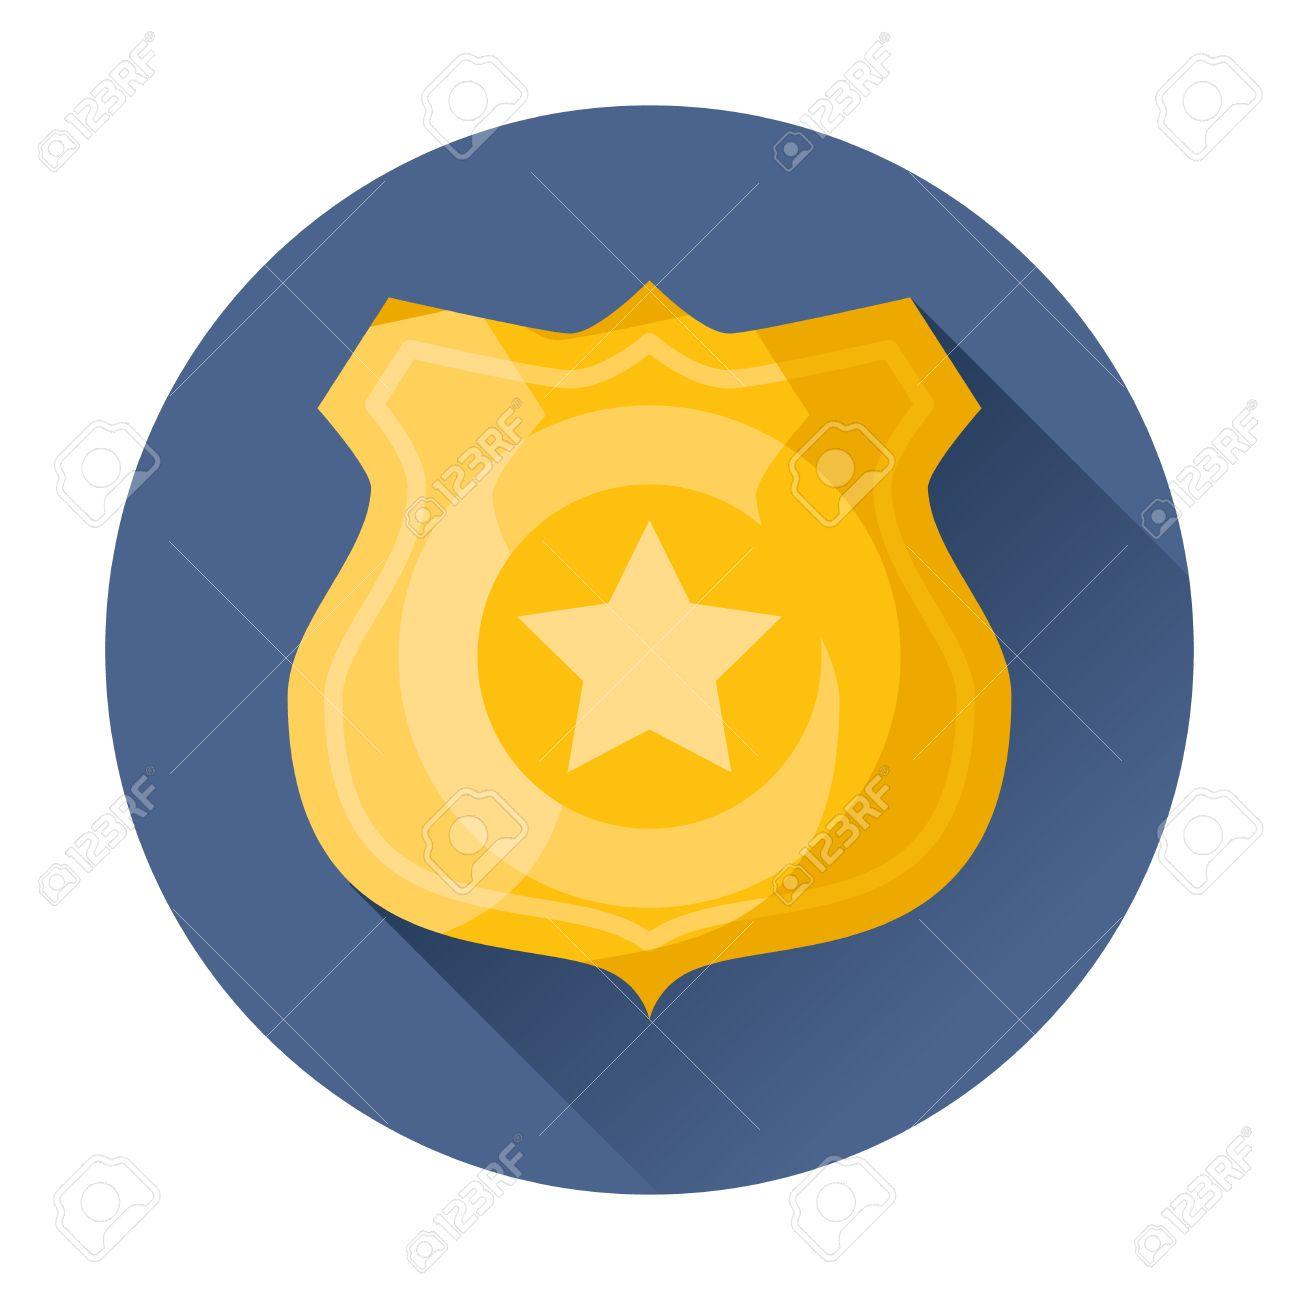 police badge icon vector illustration royalty free cliparts vectors